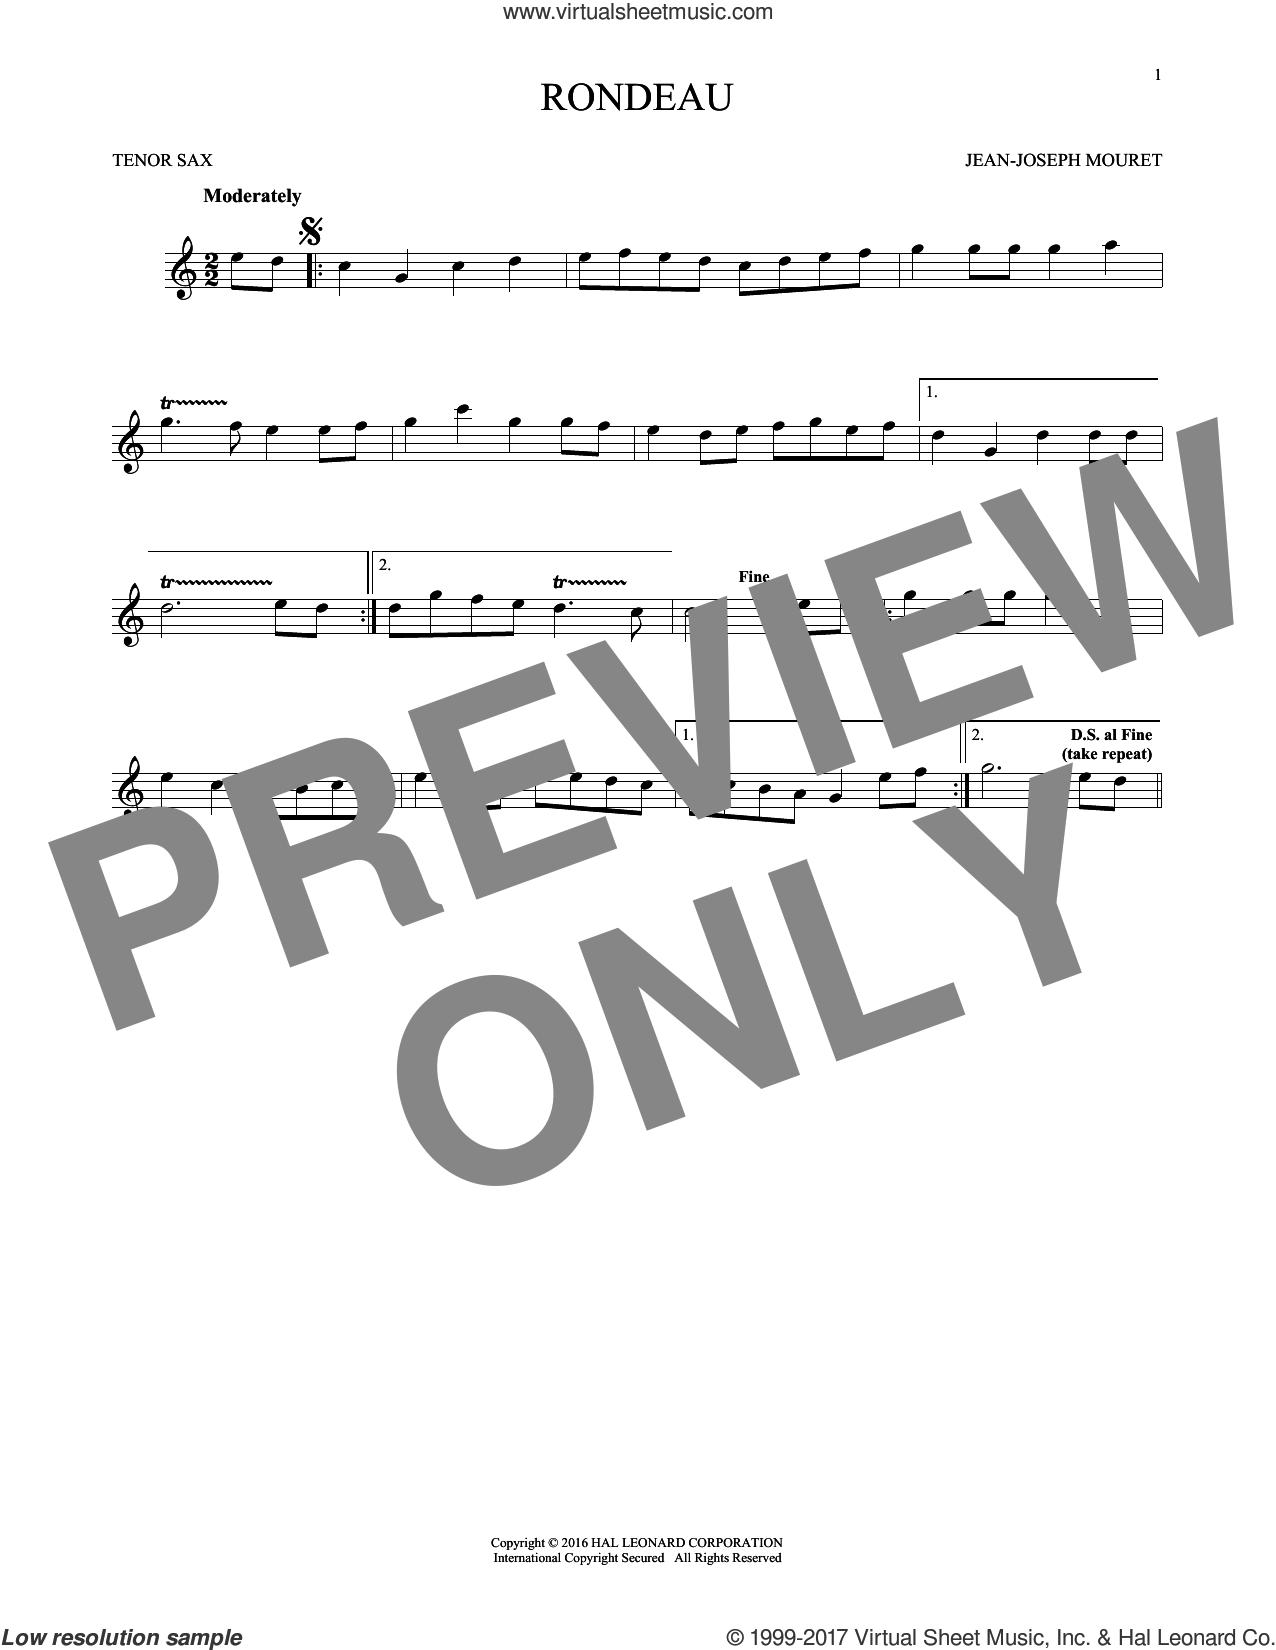 Fanfare Rondeau sheet music for tenor saxophone solo by Jean-Joseph Mouret, classical score, intermediate skill level